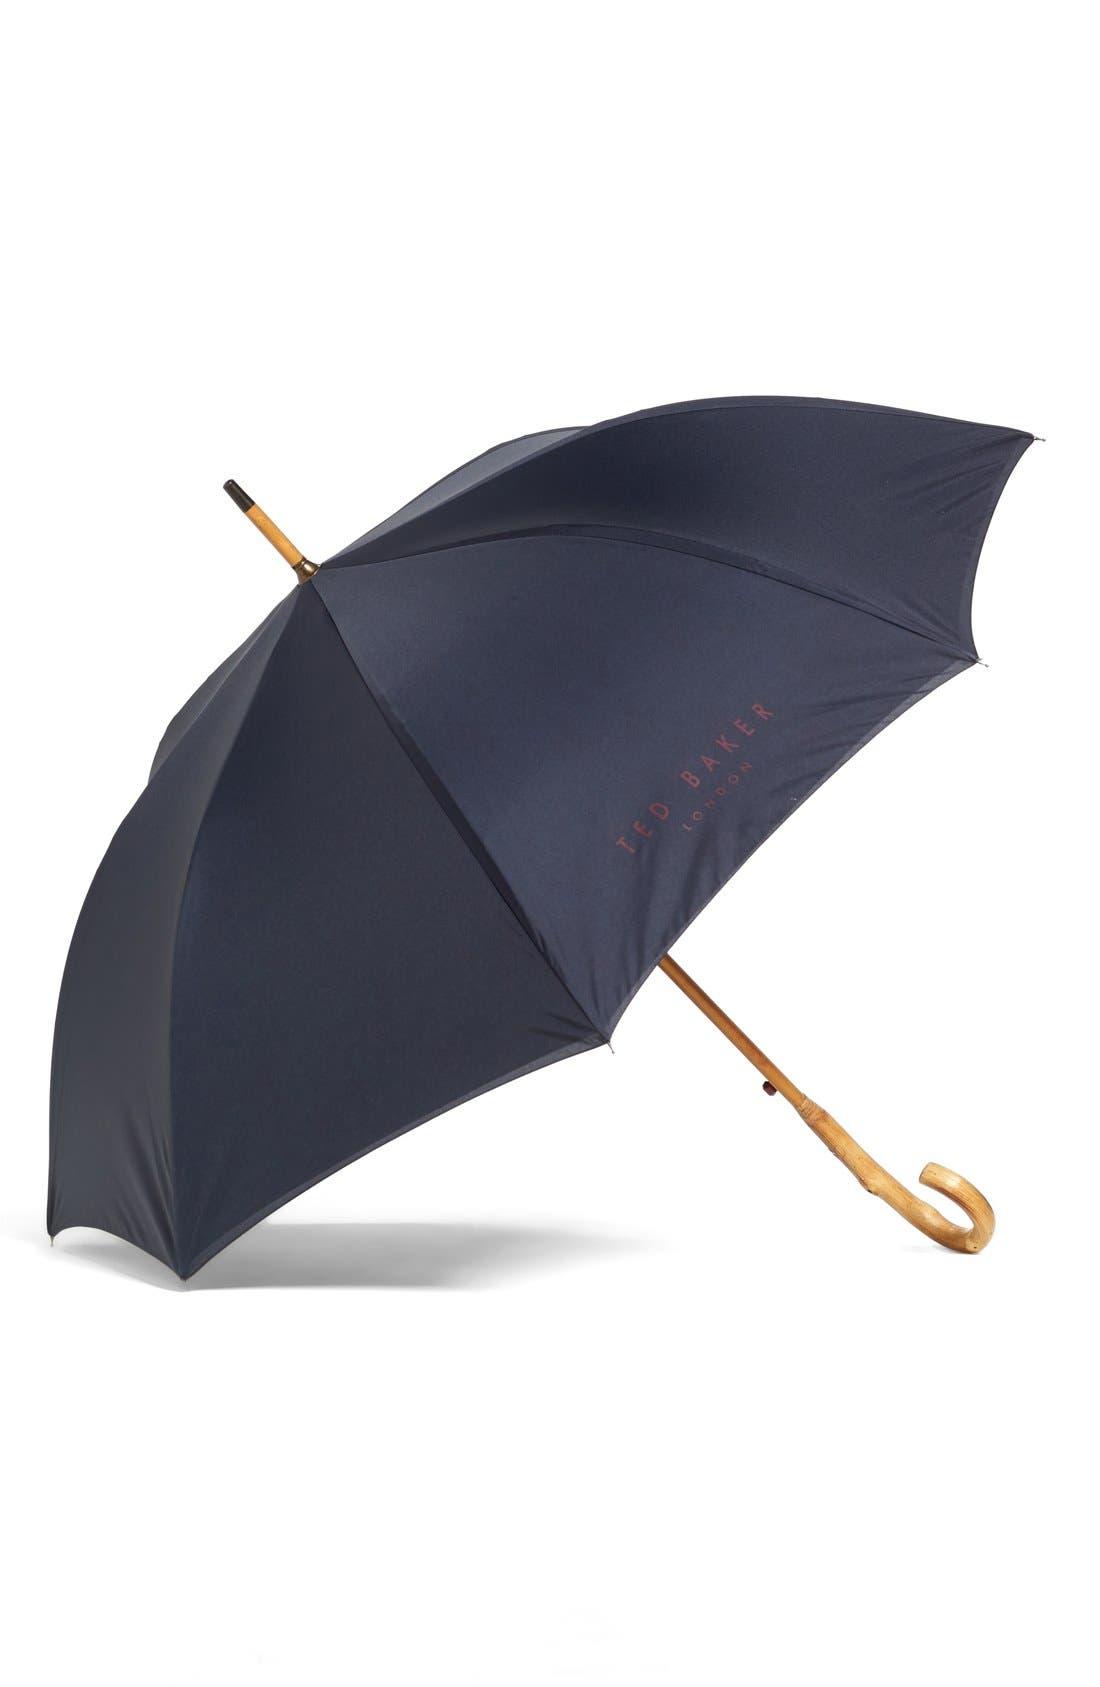 Alternate Image 1 Selected - Ted Baker London Bucket Walker Umbrella